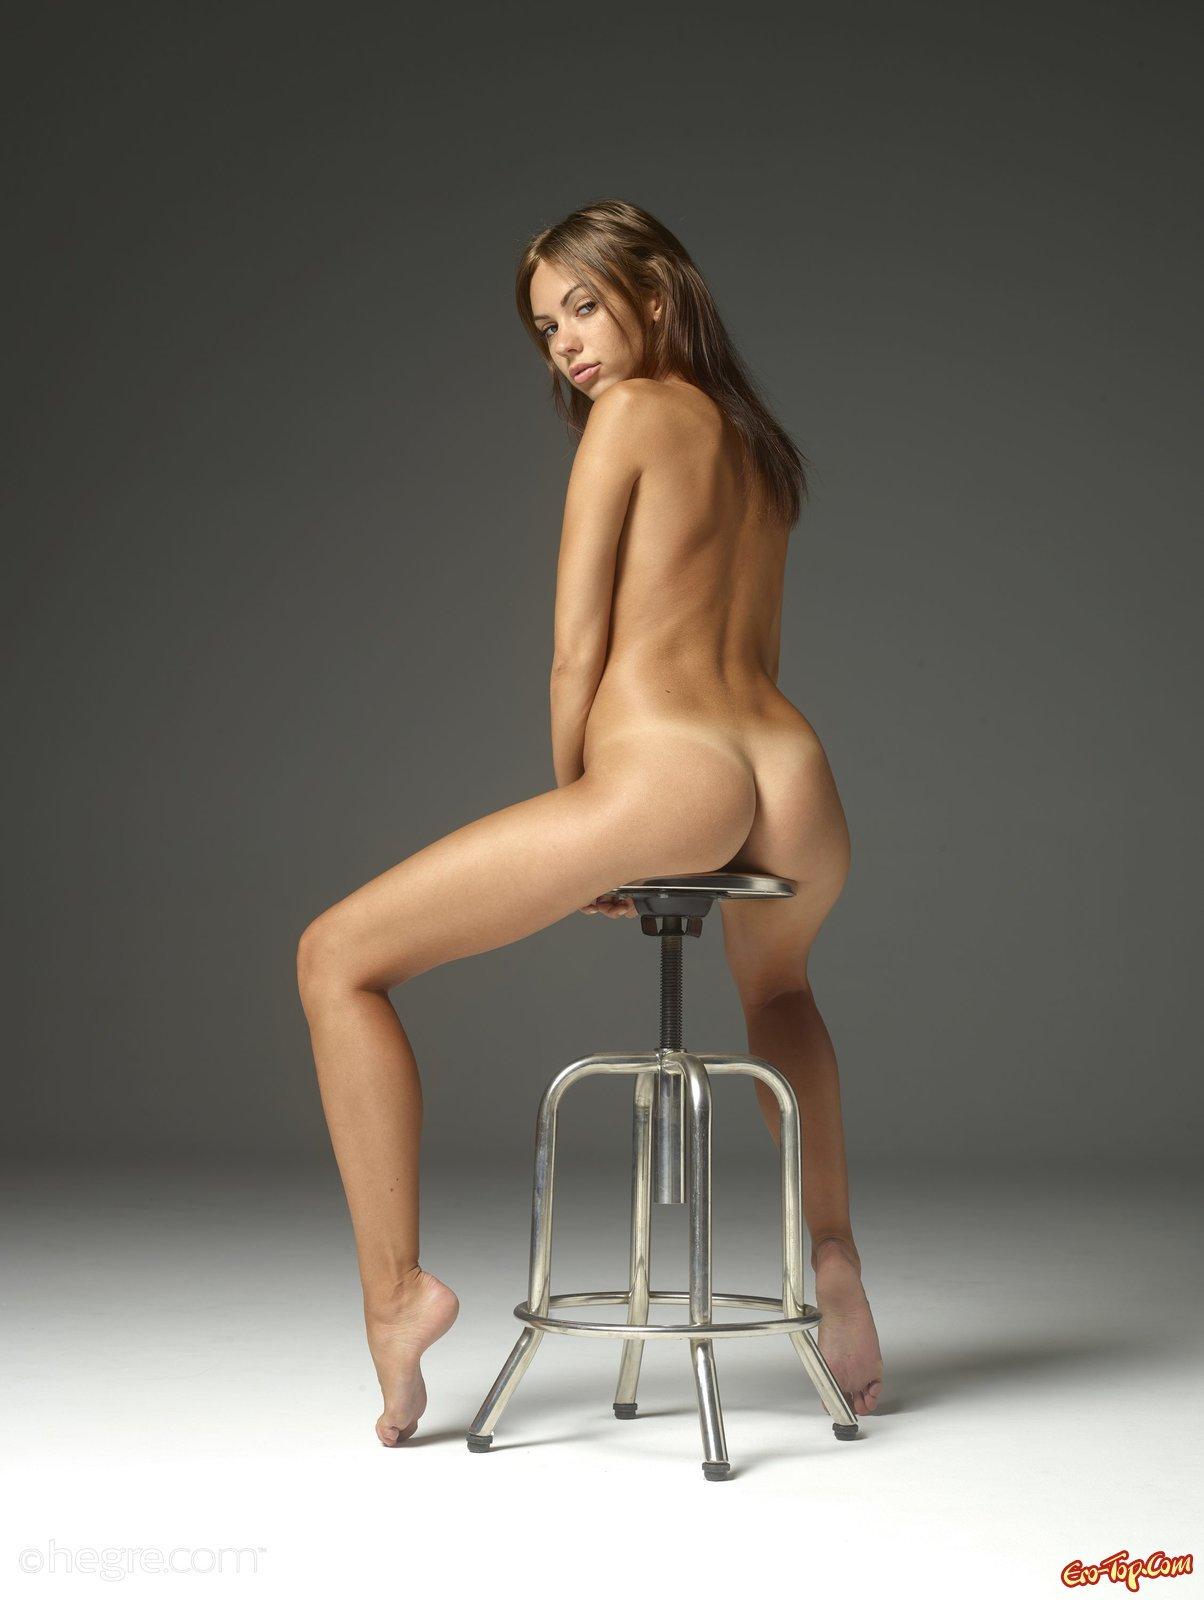 Девица делает селфи голой на железной табуретке